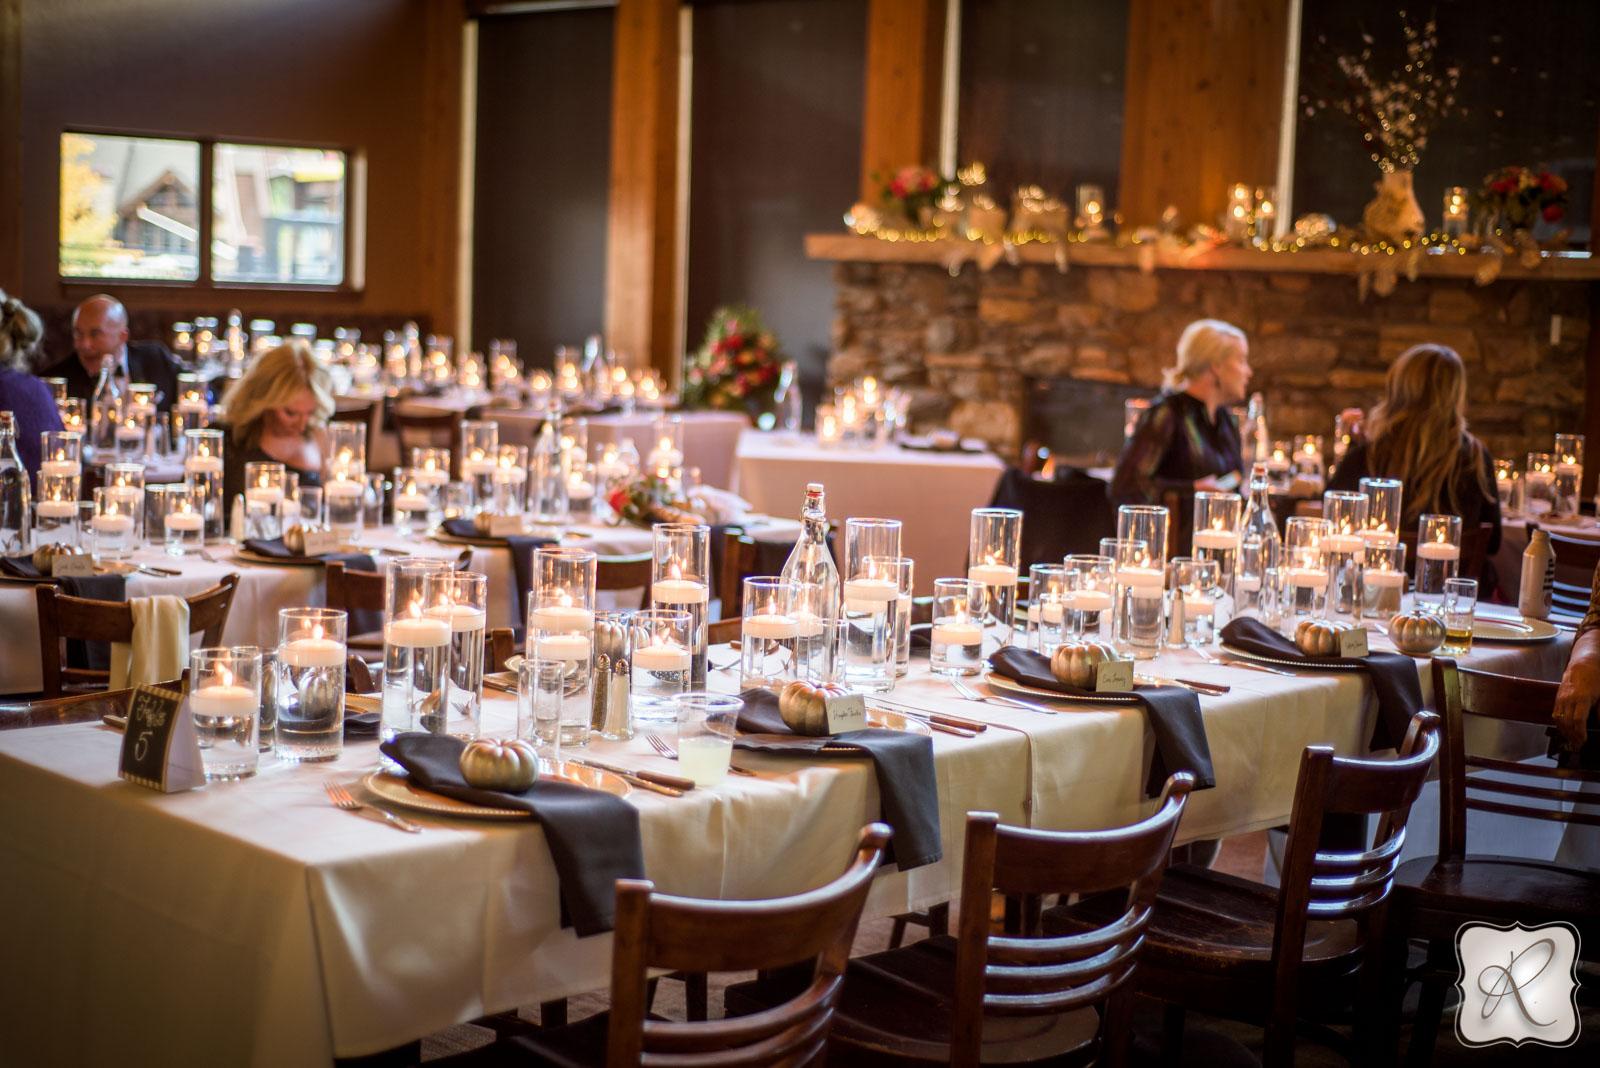 Romantic wedding receptions